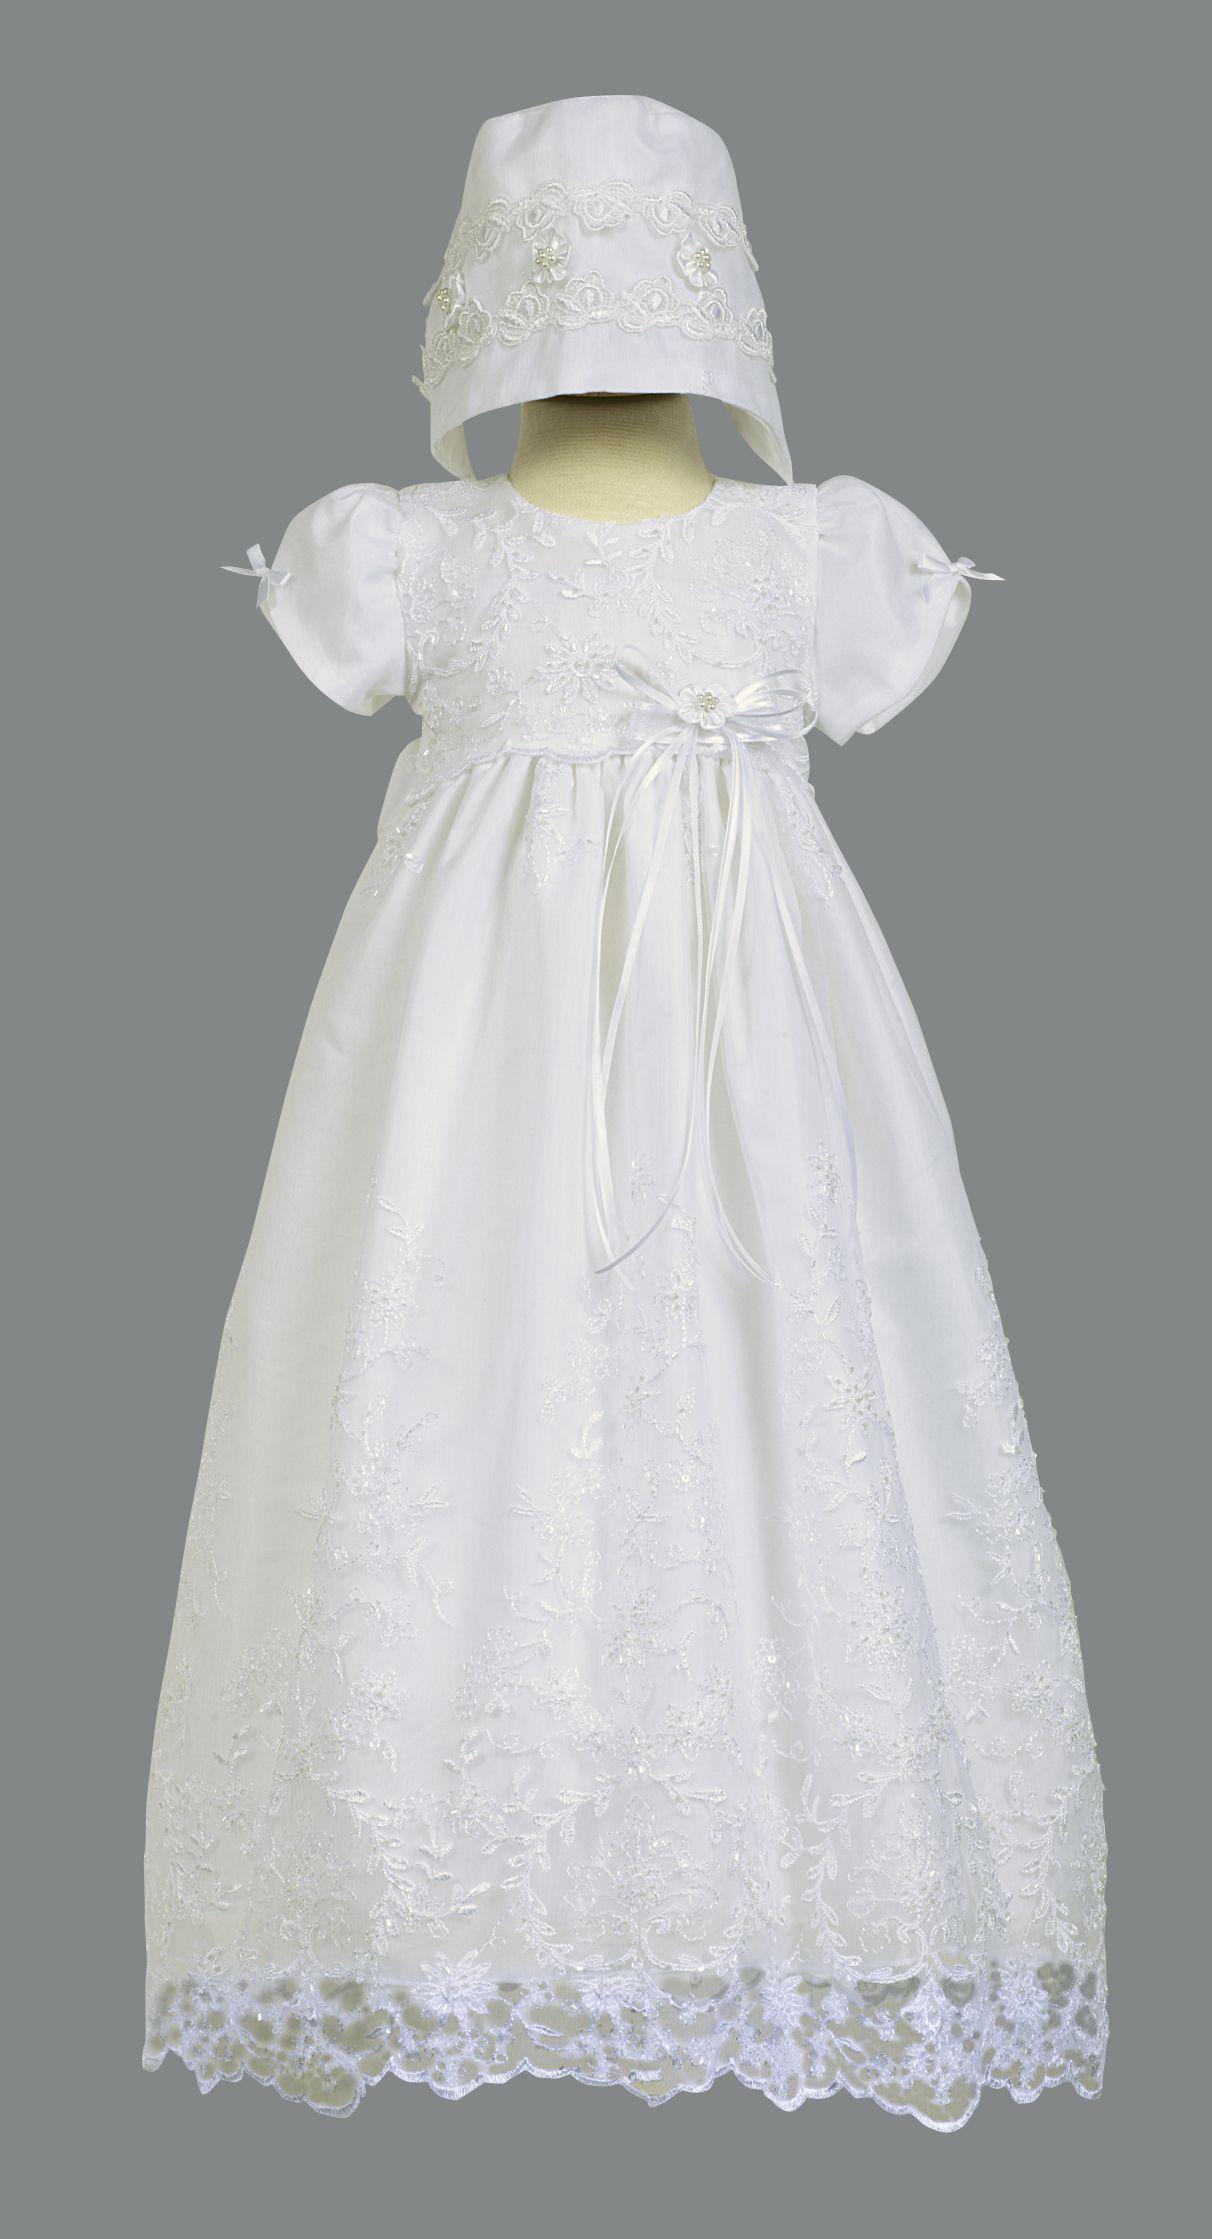 Image result for christening gowns for girls | Baby Stuff | Pinterest